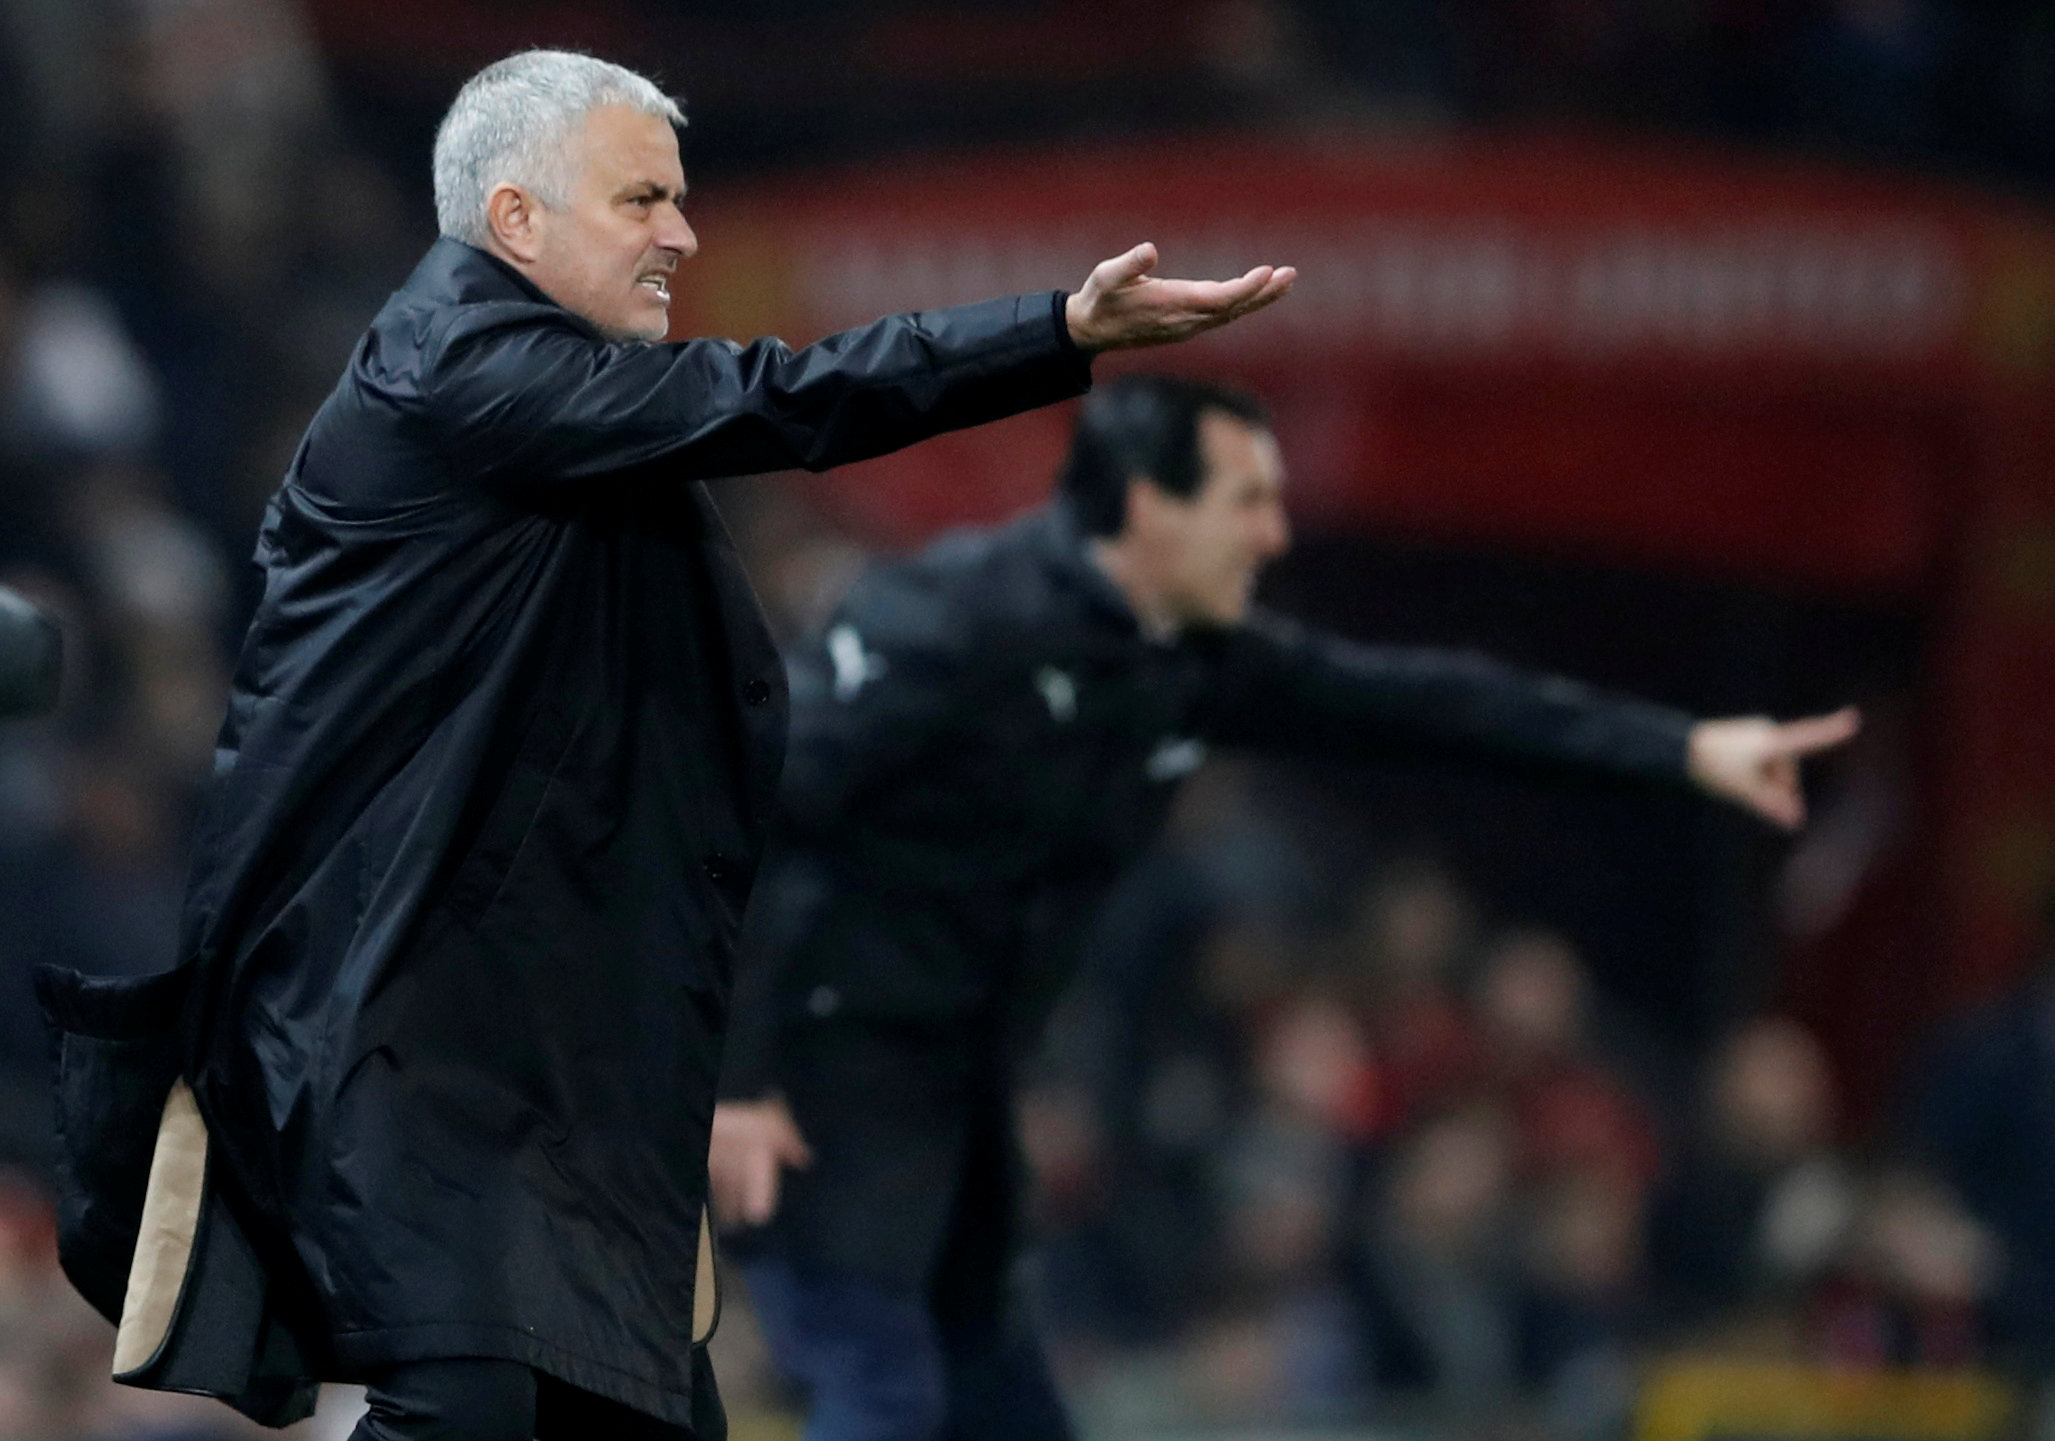 Football - Transferts - Le Journal du mercato : Mourinho vise la place d'Emery à Arsenal